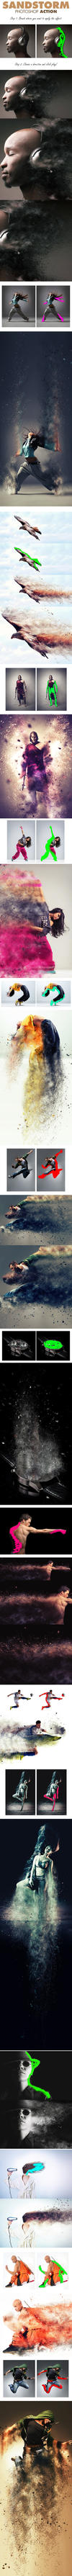 SandStorm Photoshop Action by MattSeibert